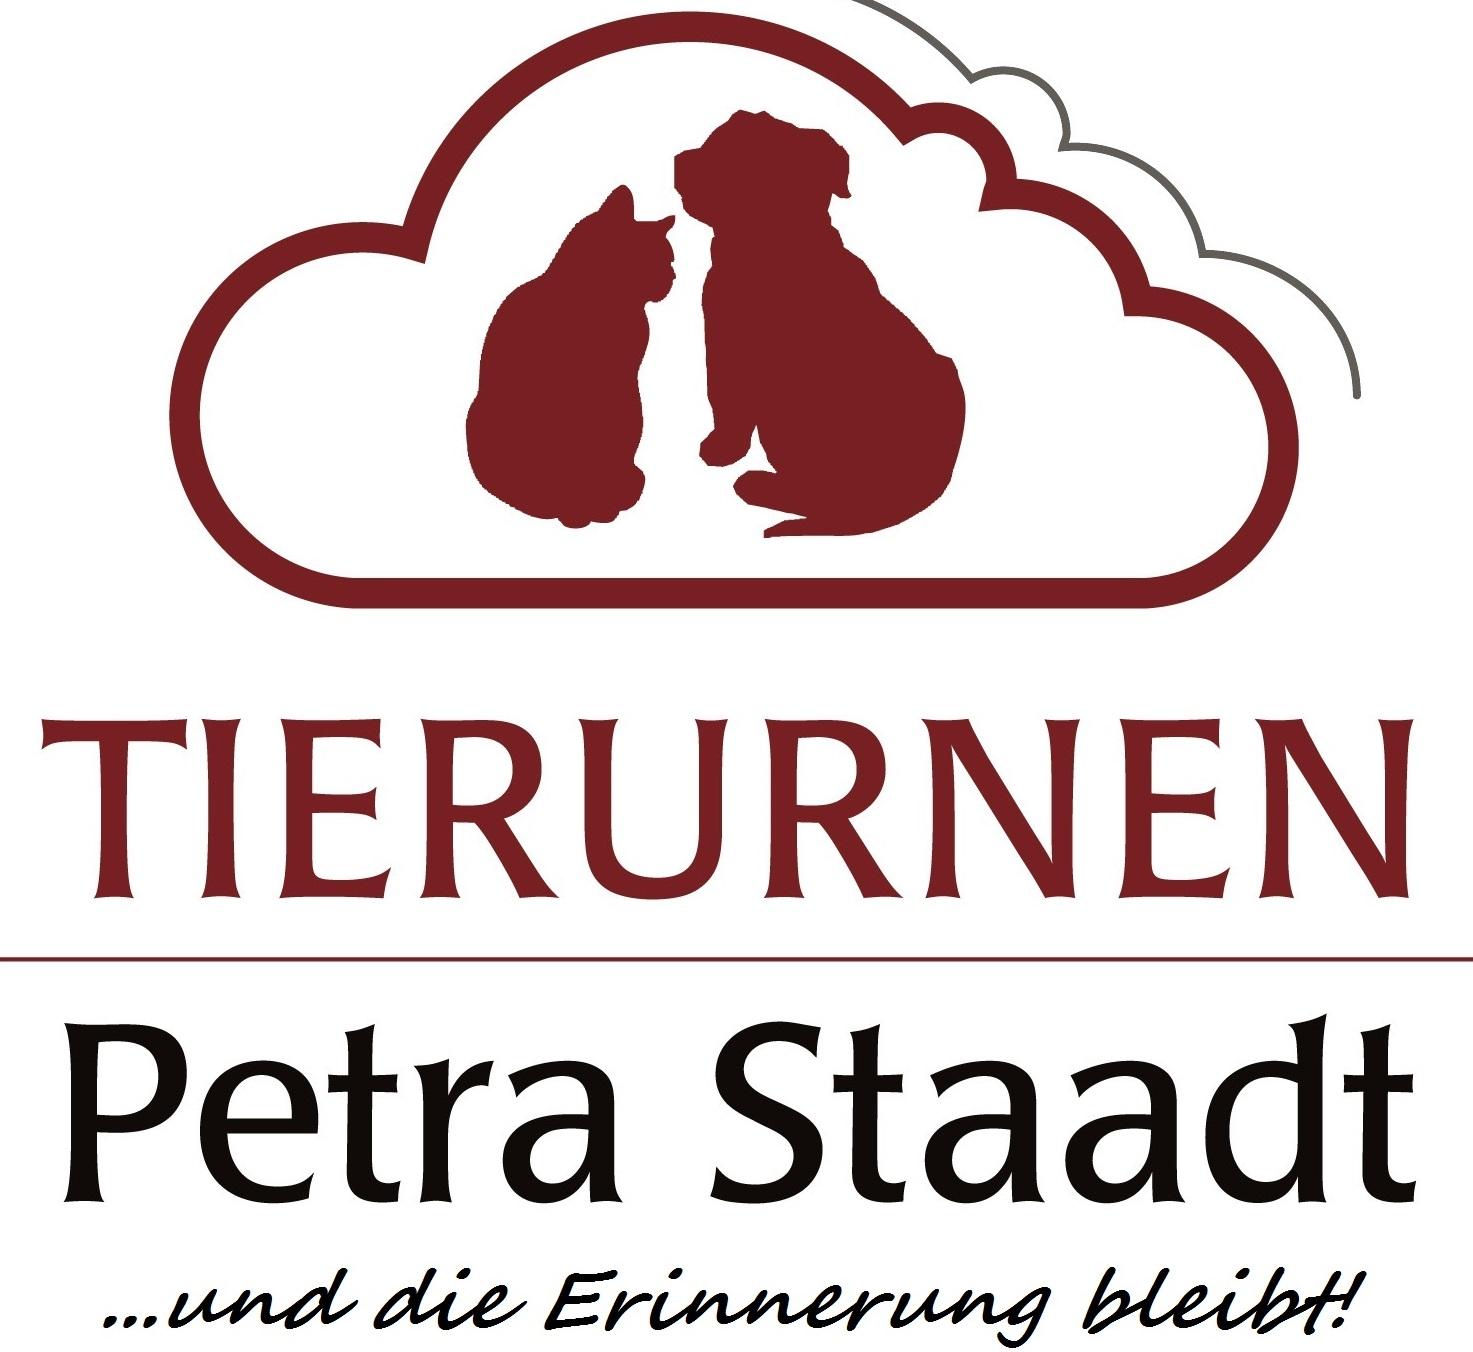 Tierurnen Petra Staadt-Logo